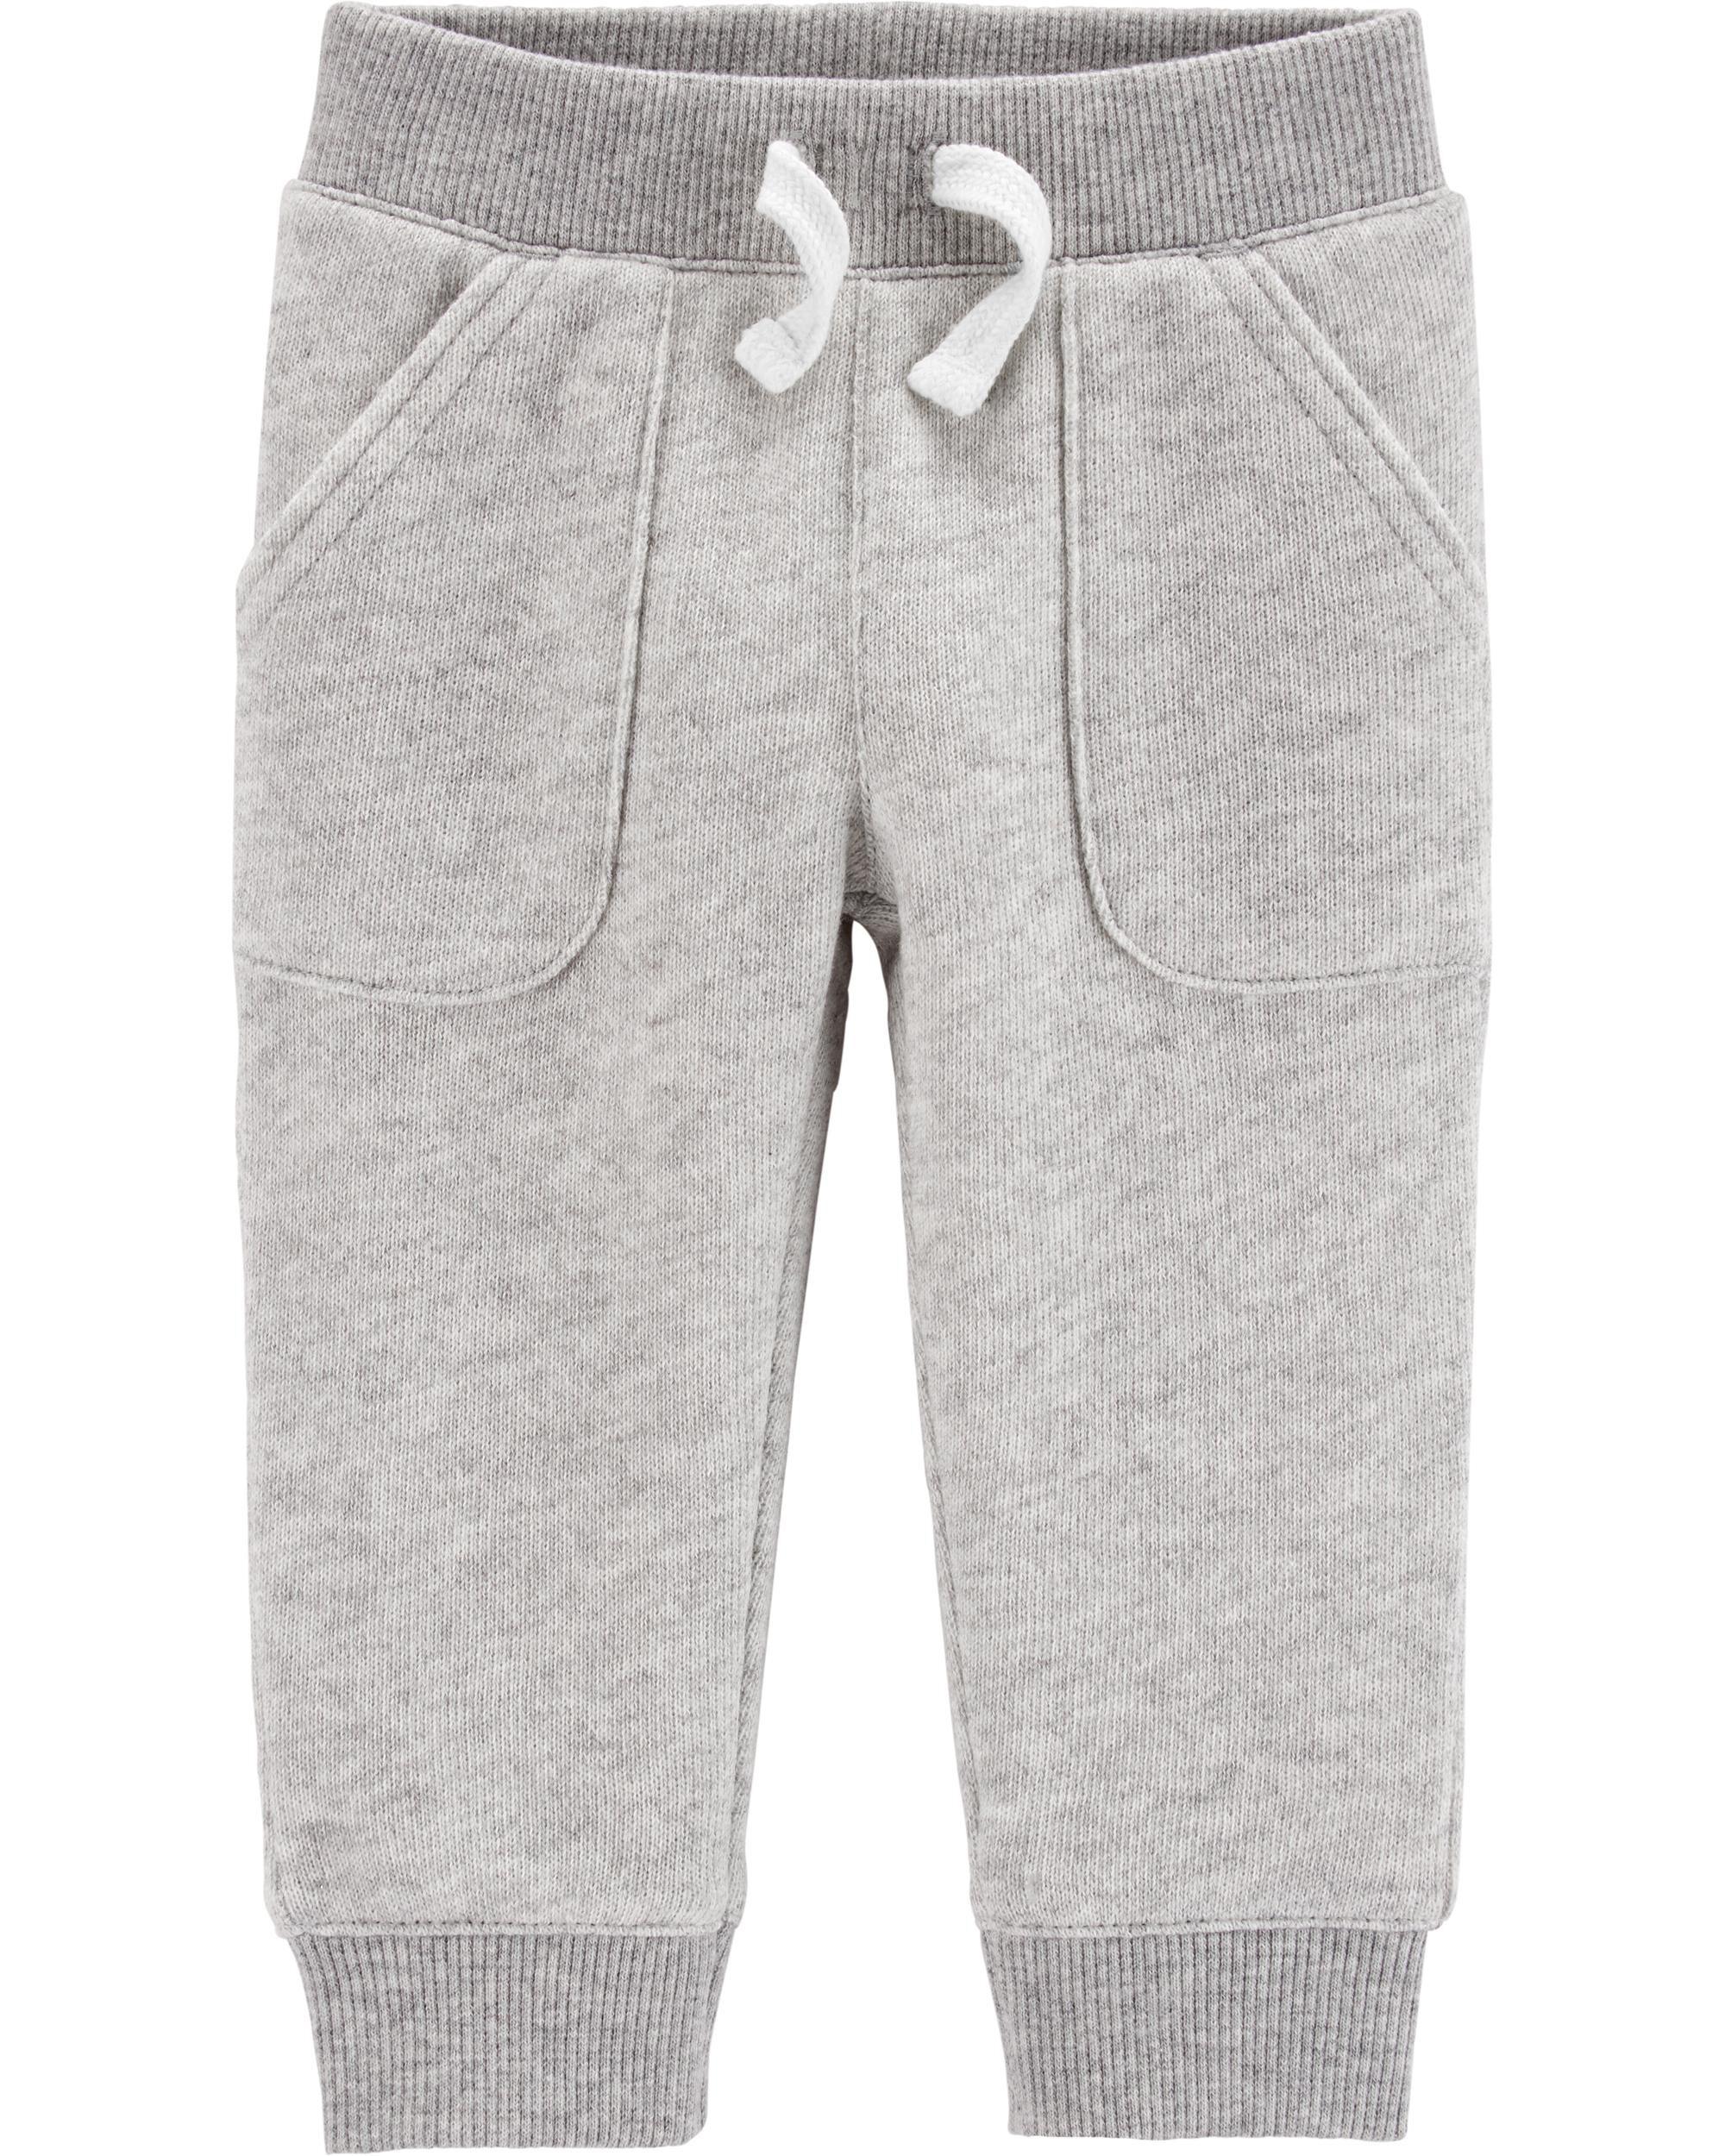 *Clearance*  Marled Yarn Pull-On Pants